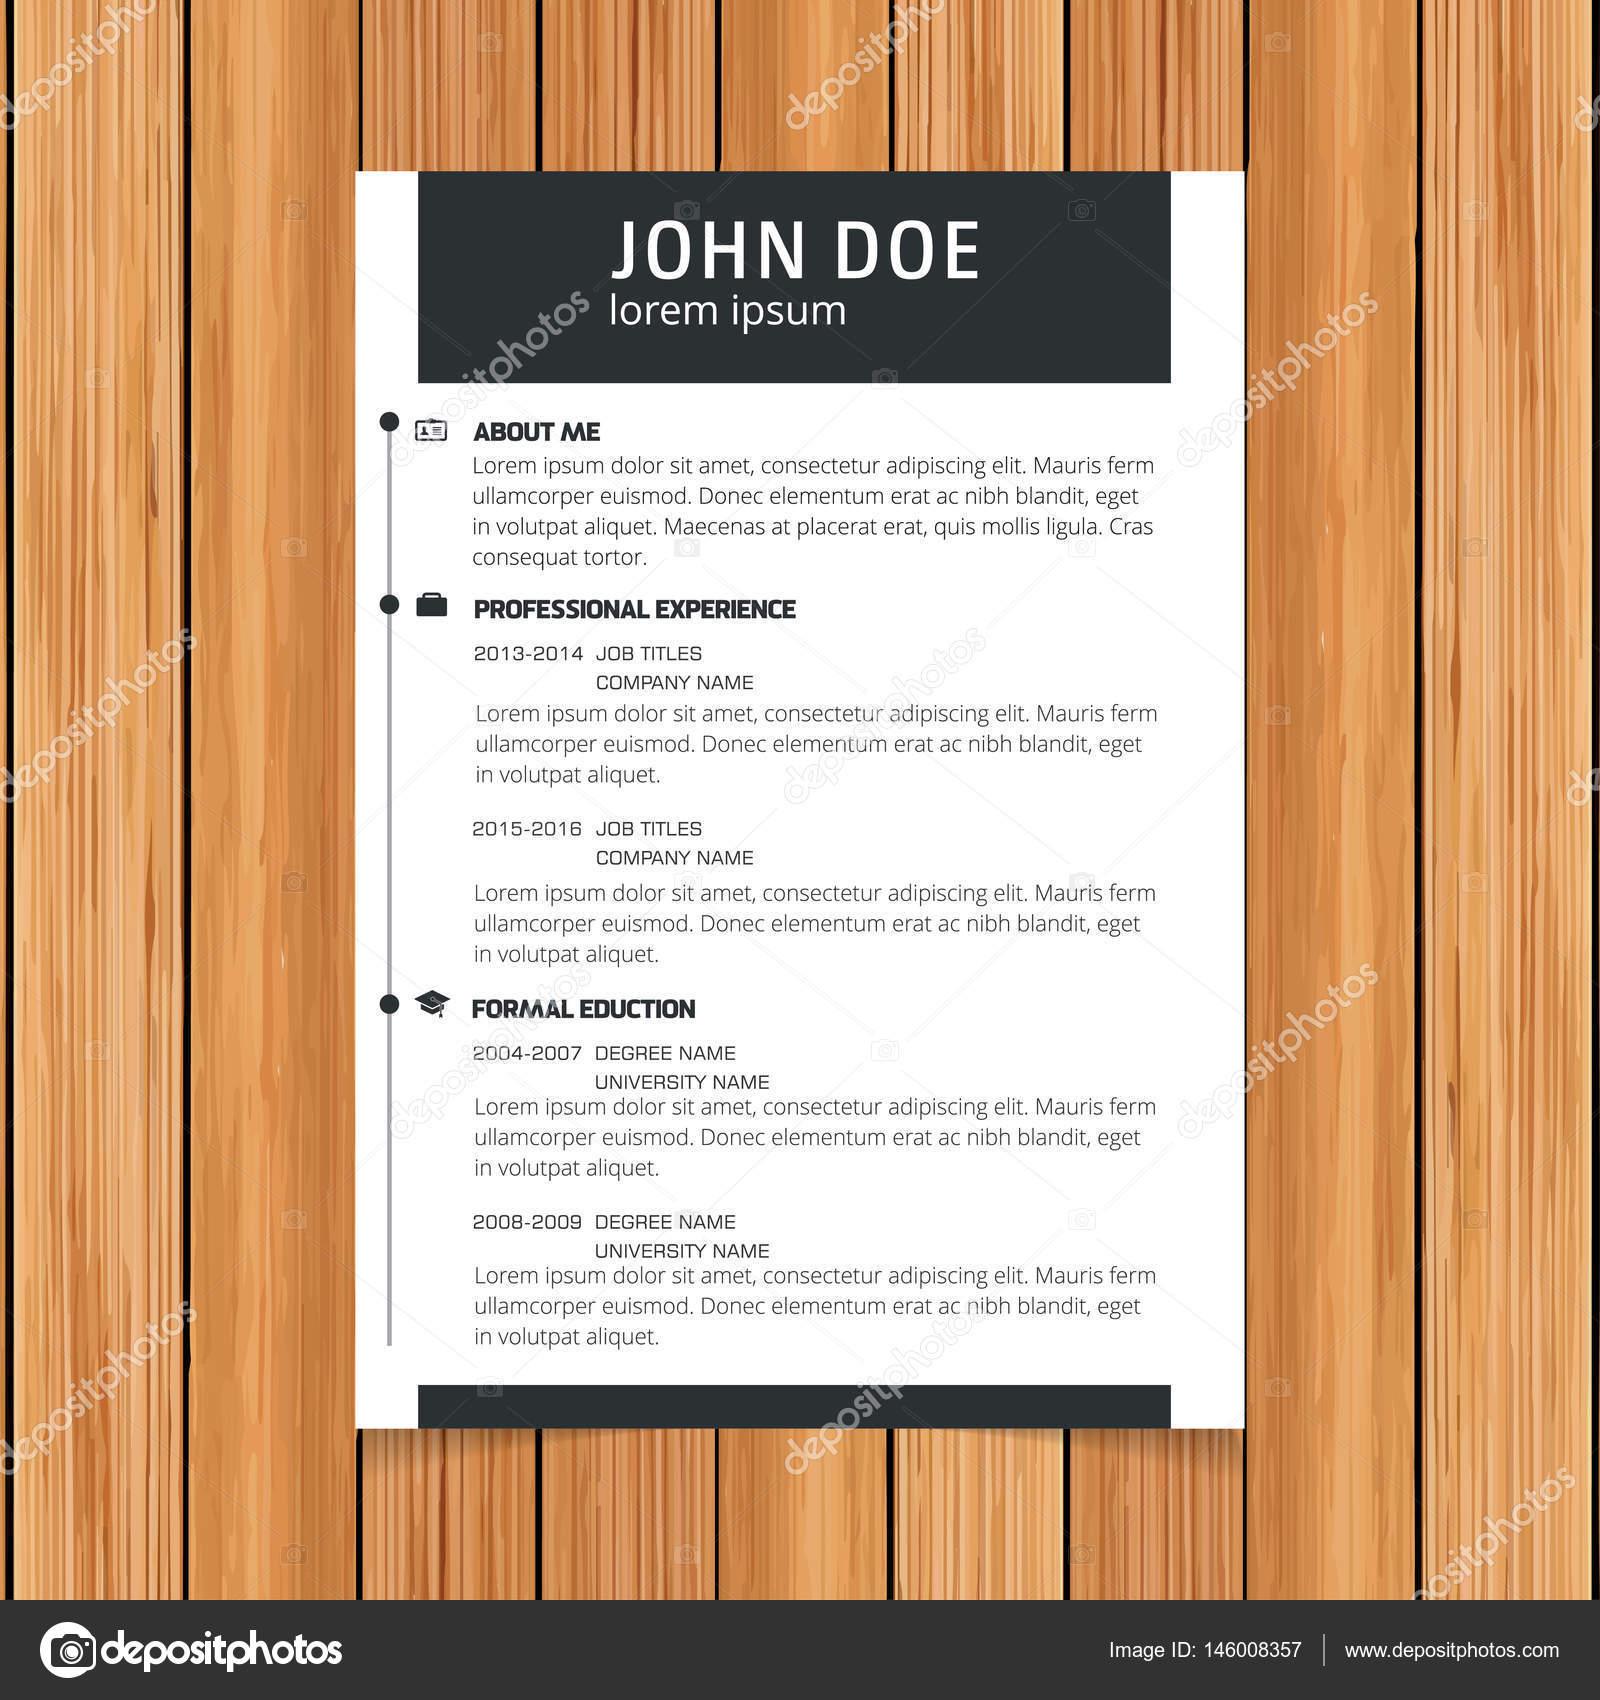 Plantilla de curriculum vitae para solicitudes de empleo — Vector de ...